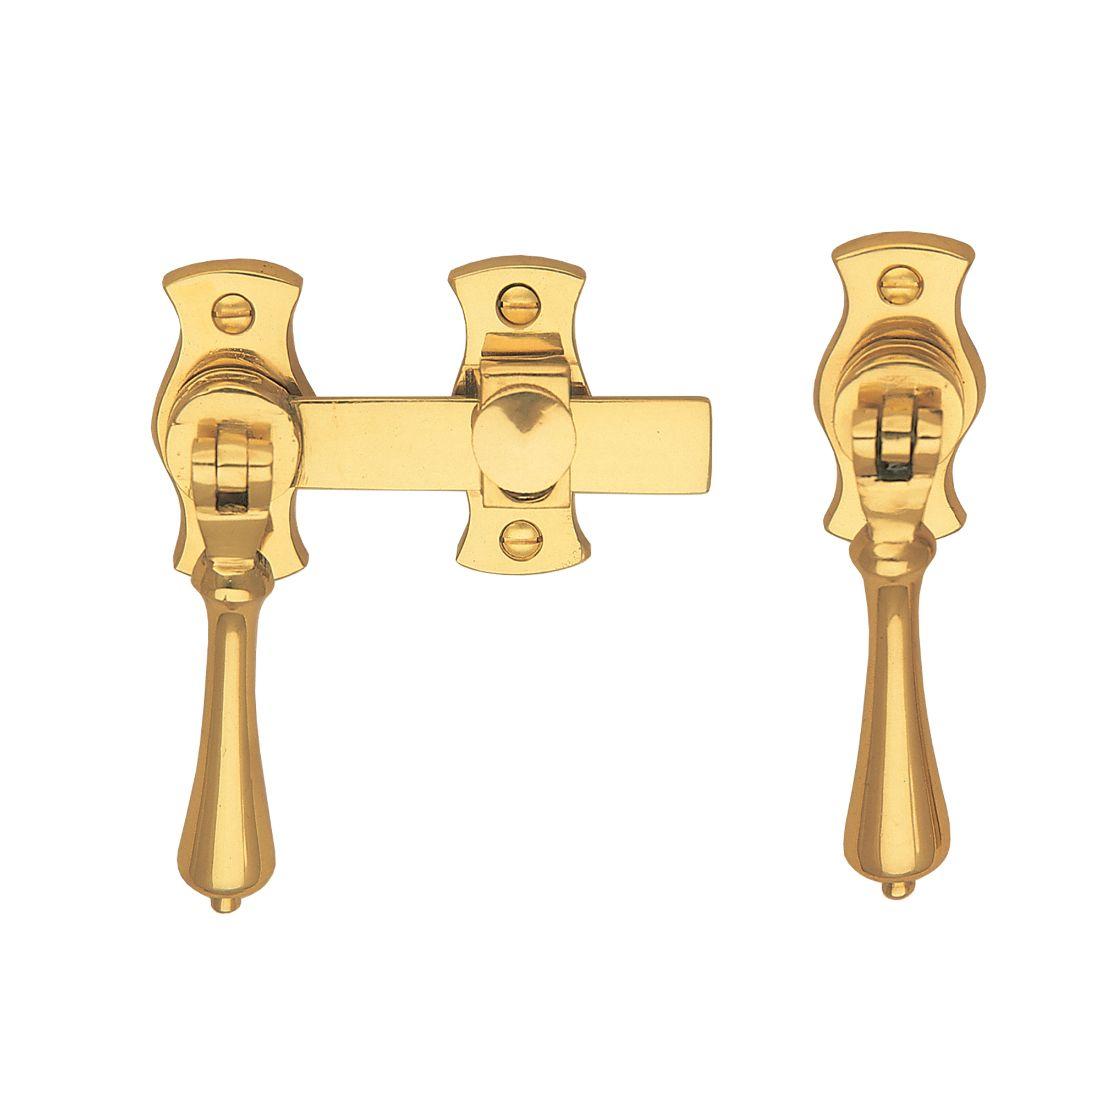 French Door Catch Teardrop Polished Brass